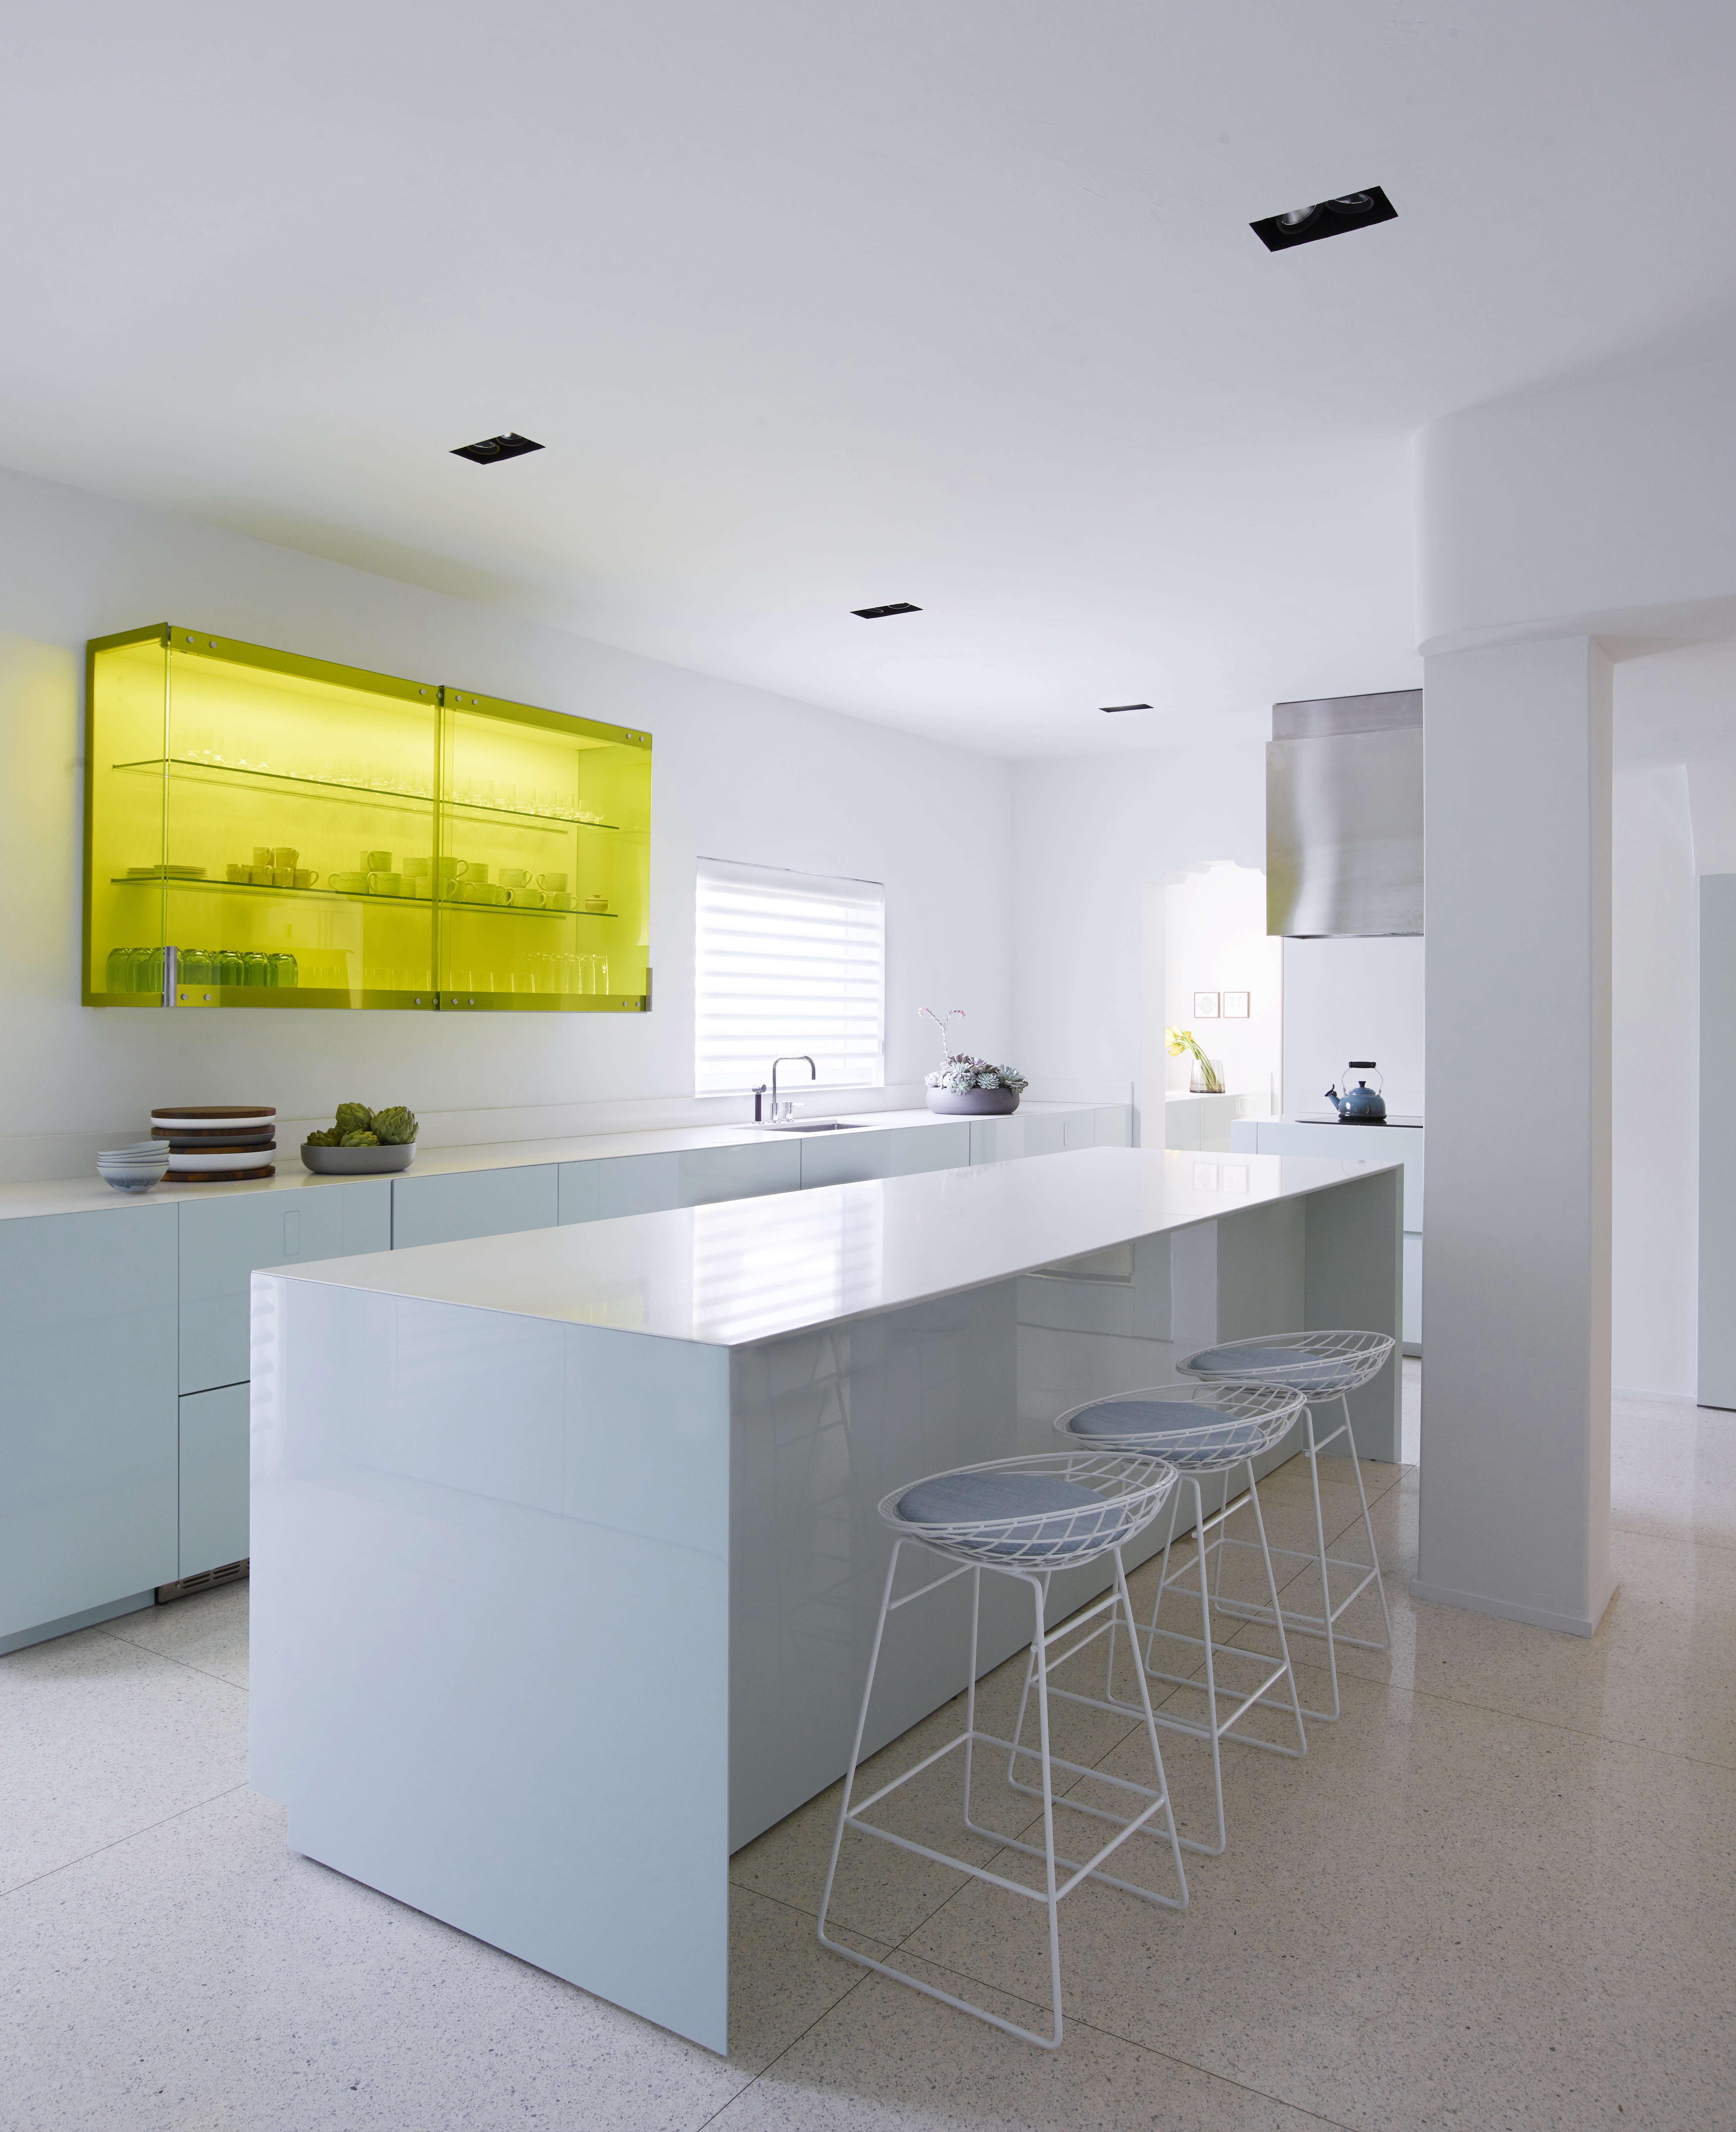 minimalist kitchen in a revived miami villa belonging to furniture dealer stephan weishaupt